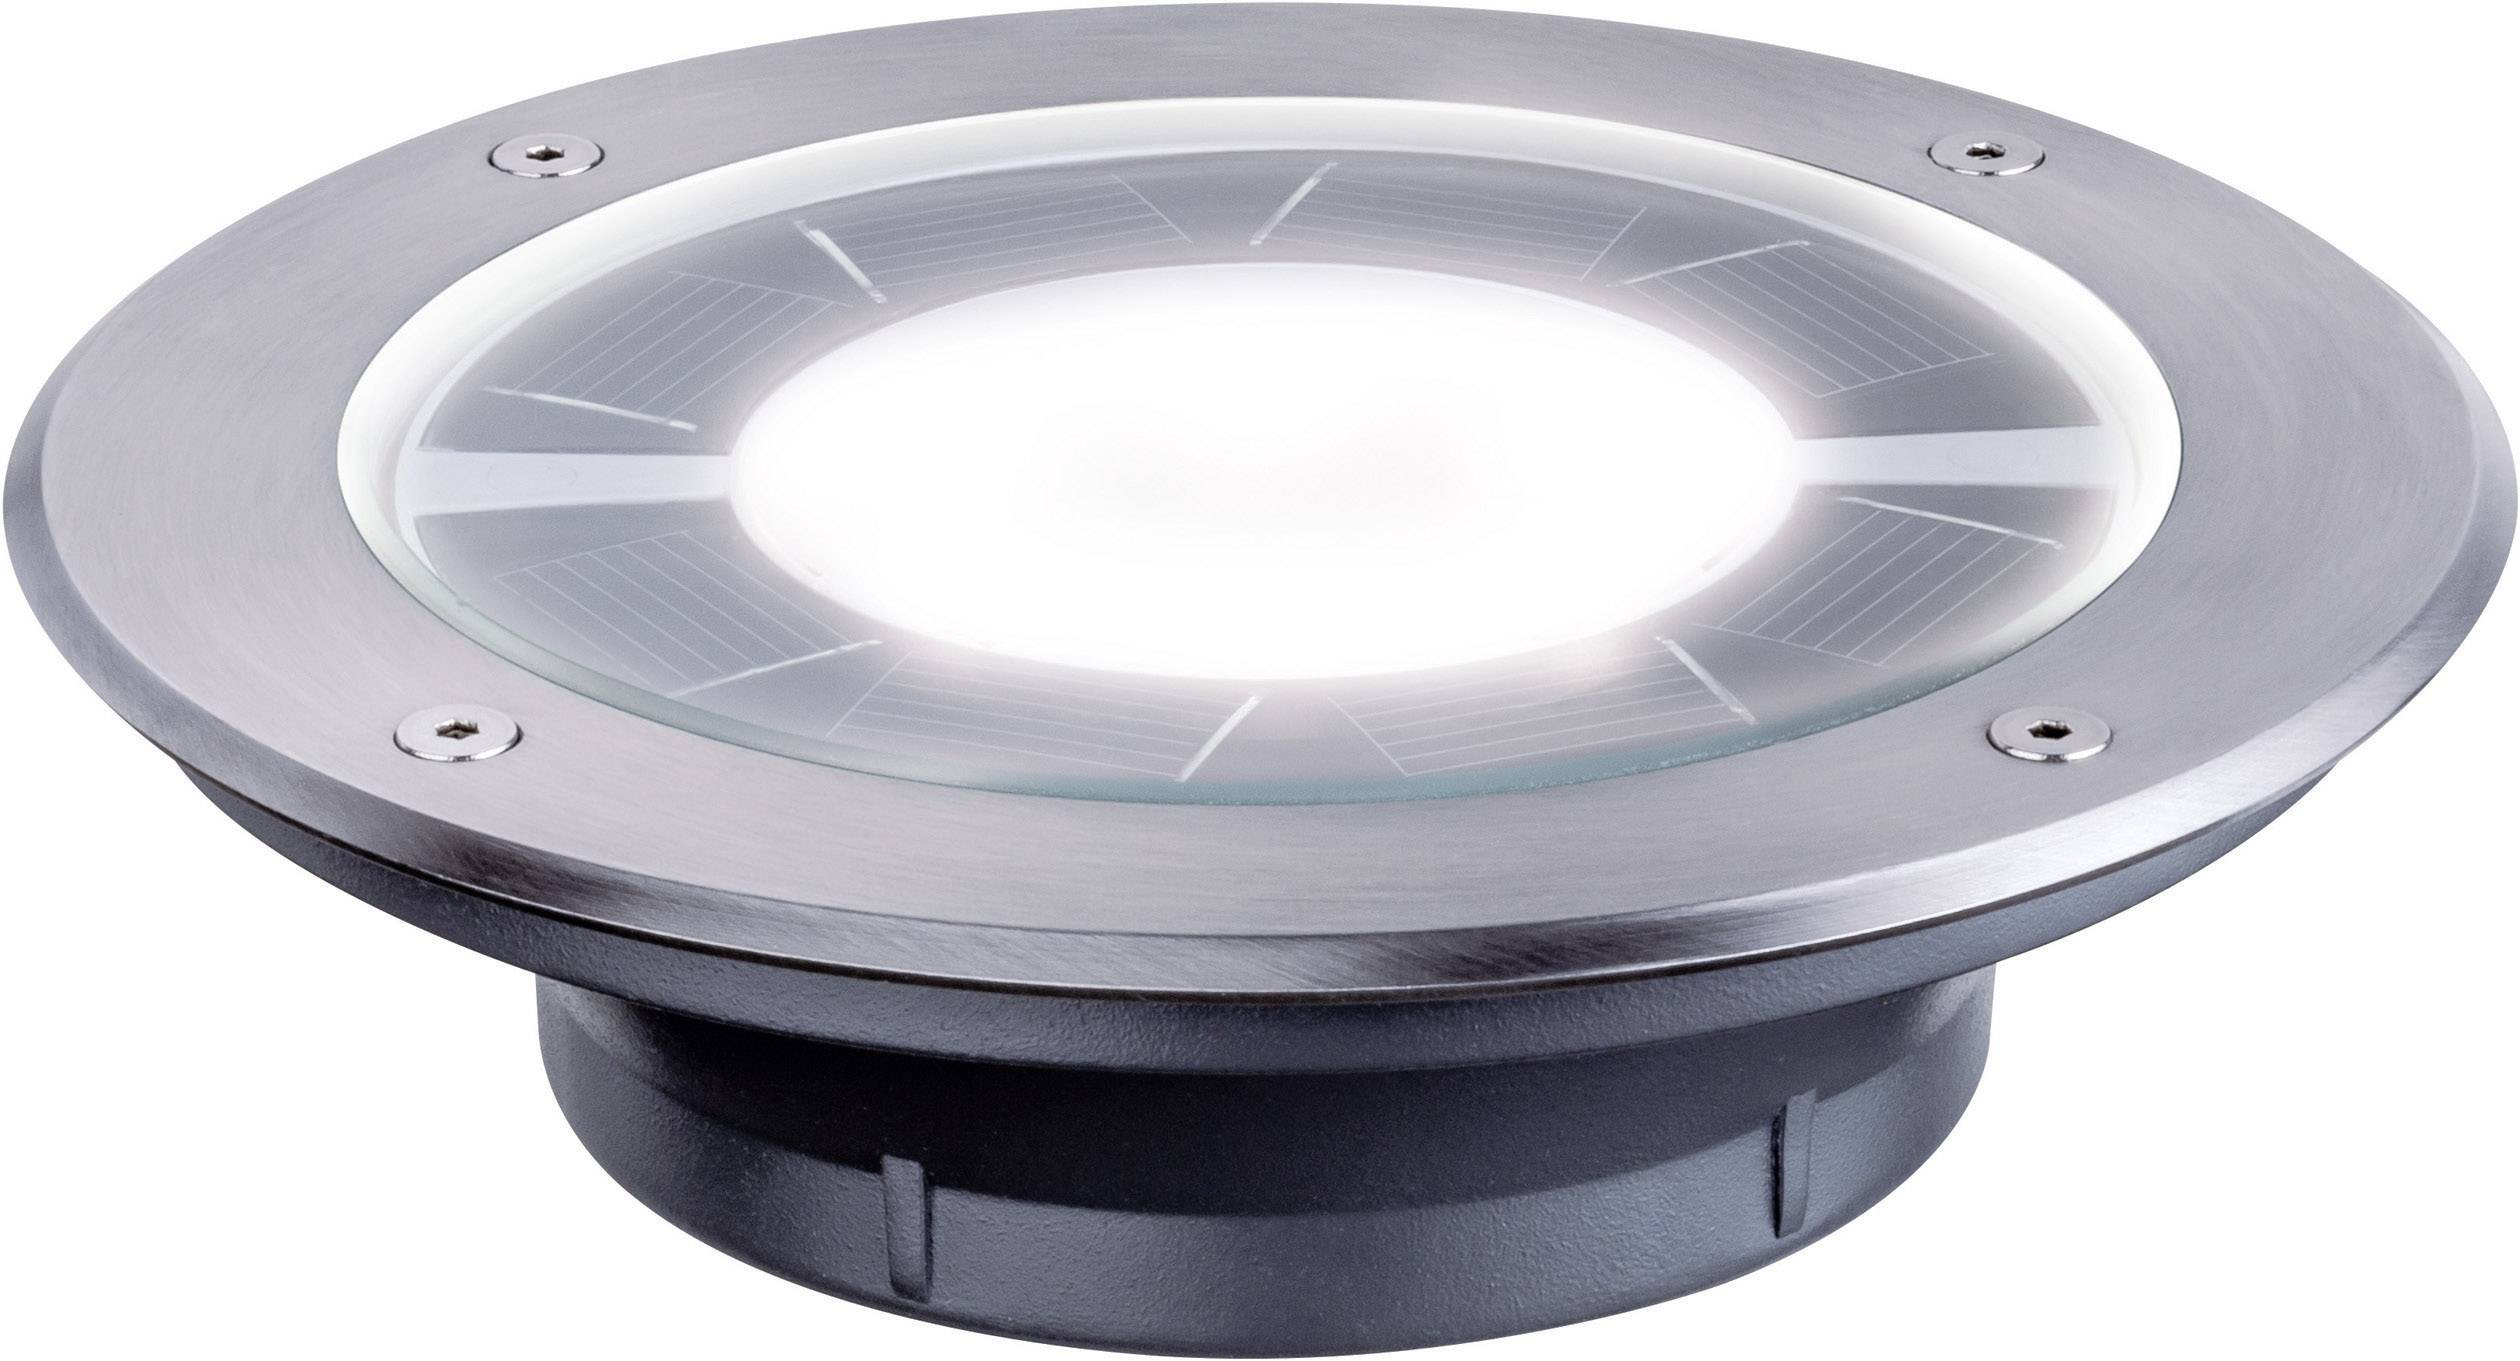 Solar Inbouwspots Tuin : Paulmann pandora solar inbouwlamp w warm wit rvs